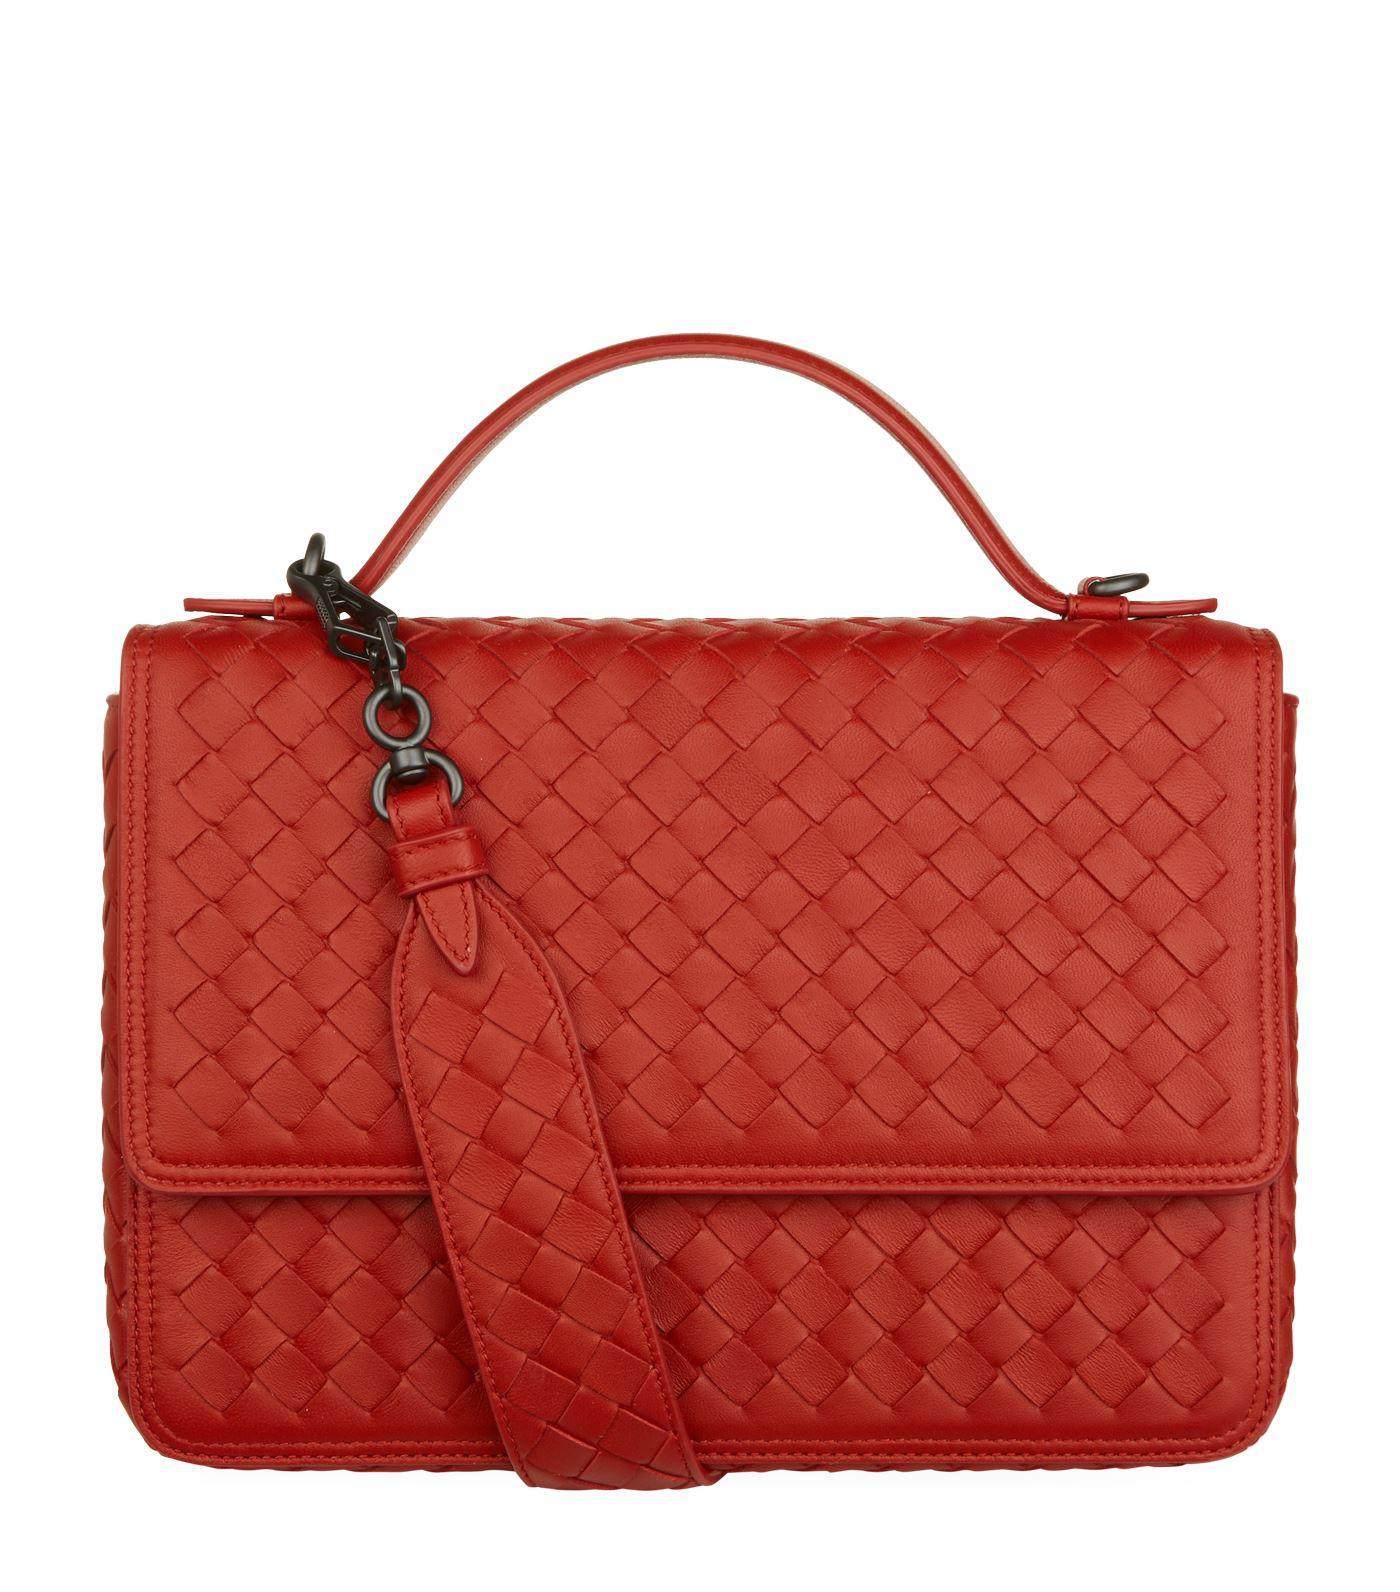 Lyst - Bottega Veneta Leather Alumna Shoulder Bag in Red 276f8affa0